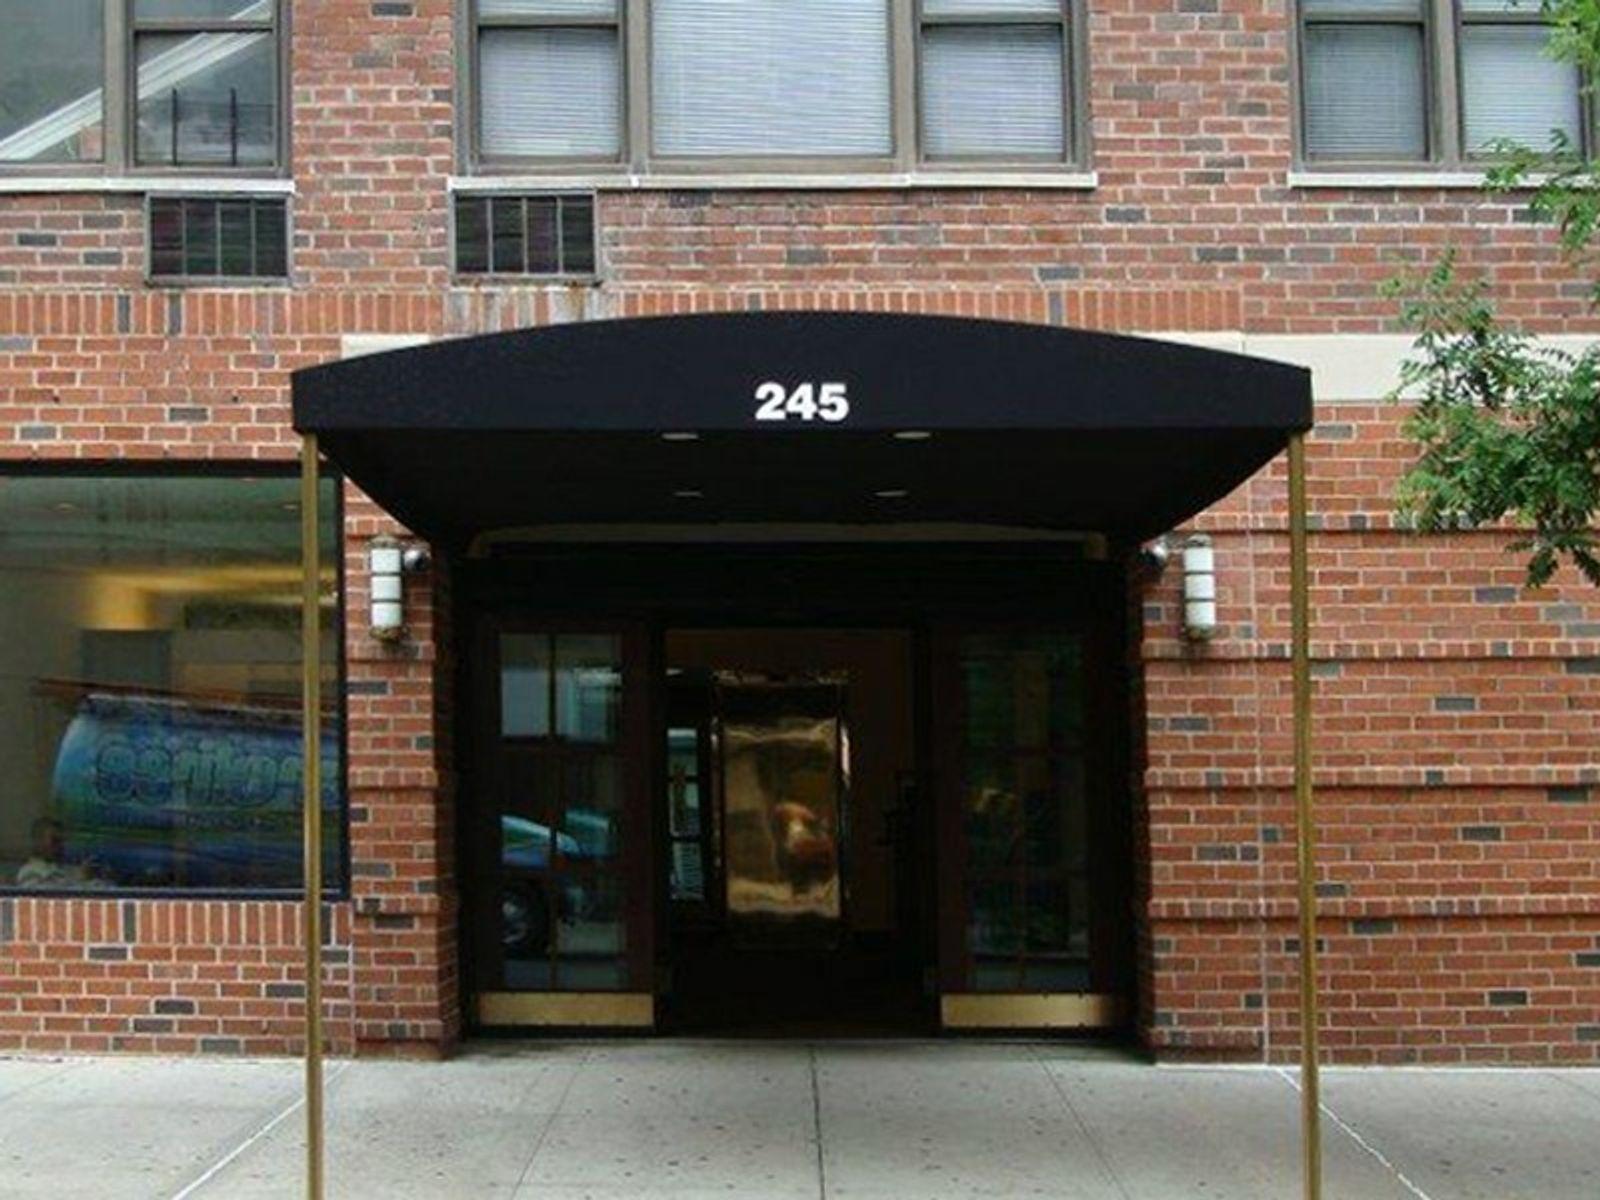 245 East 24th Street